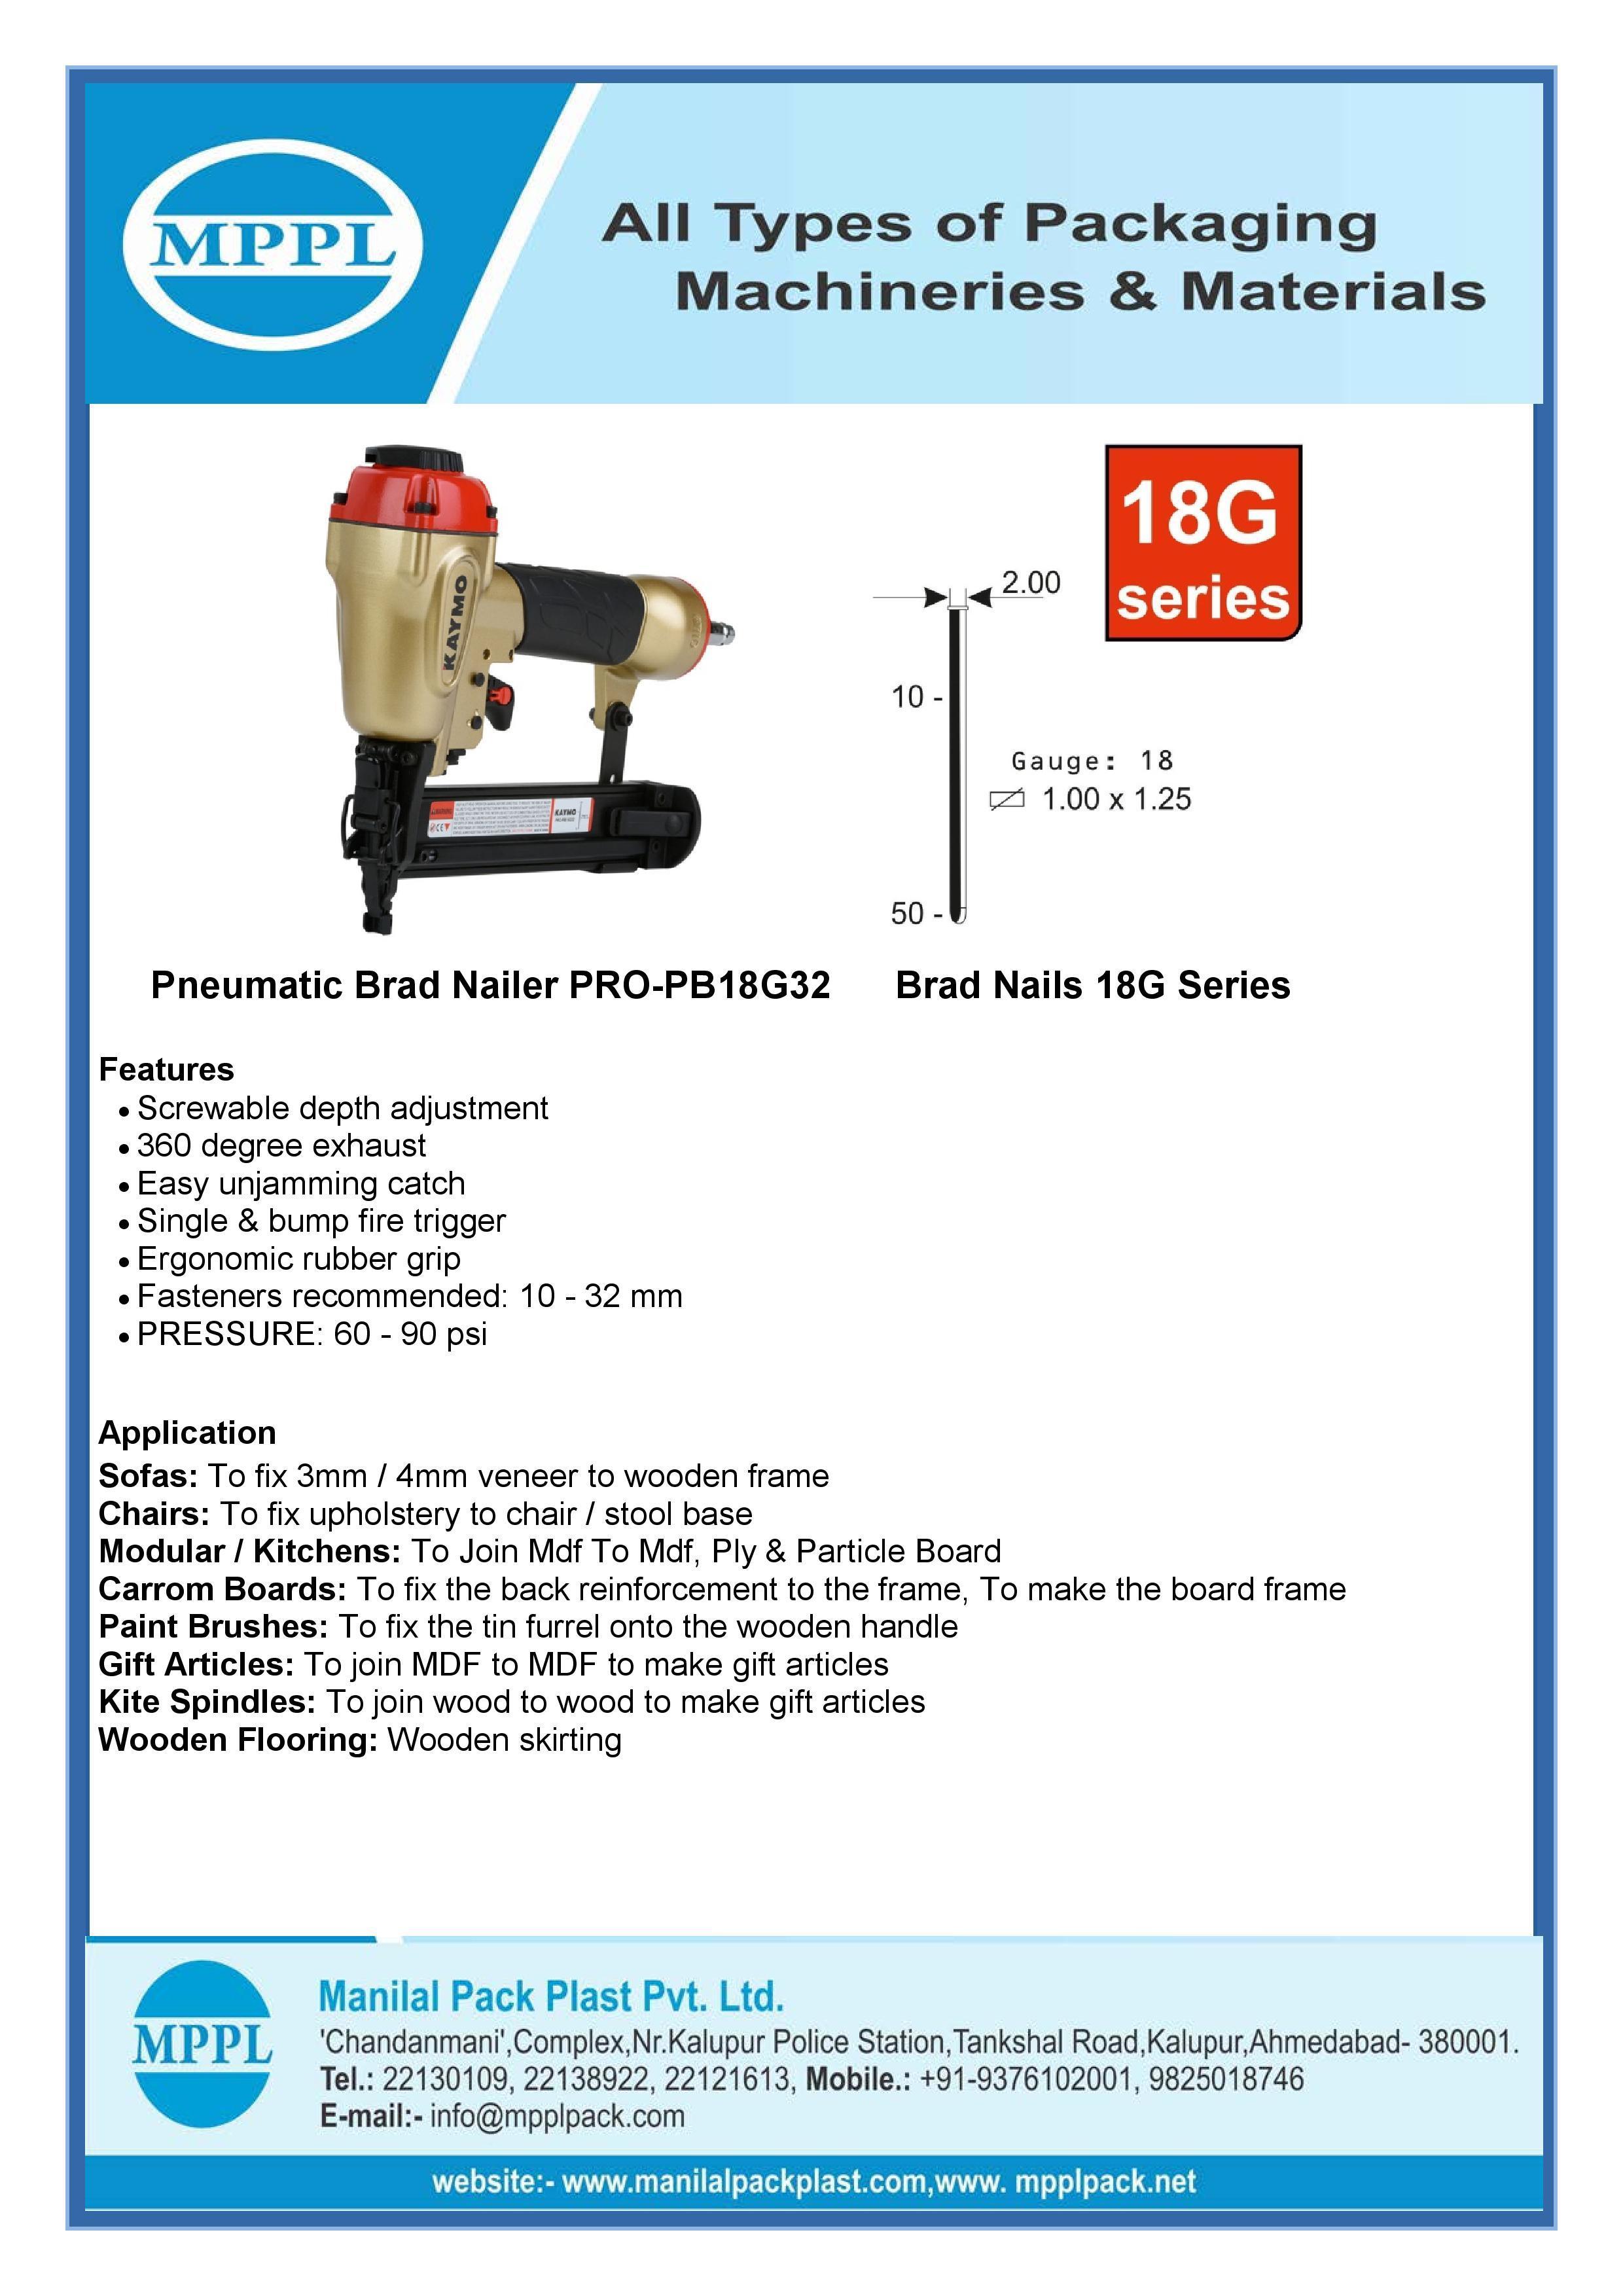 Pneumatic Brad Nailer PRO-PB18G32